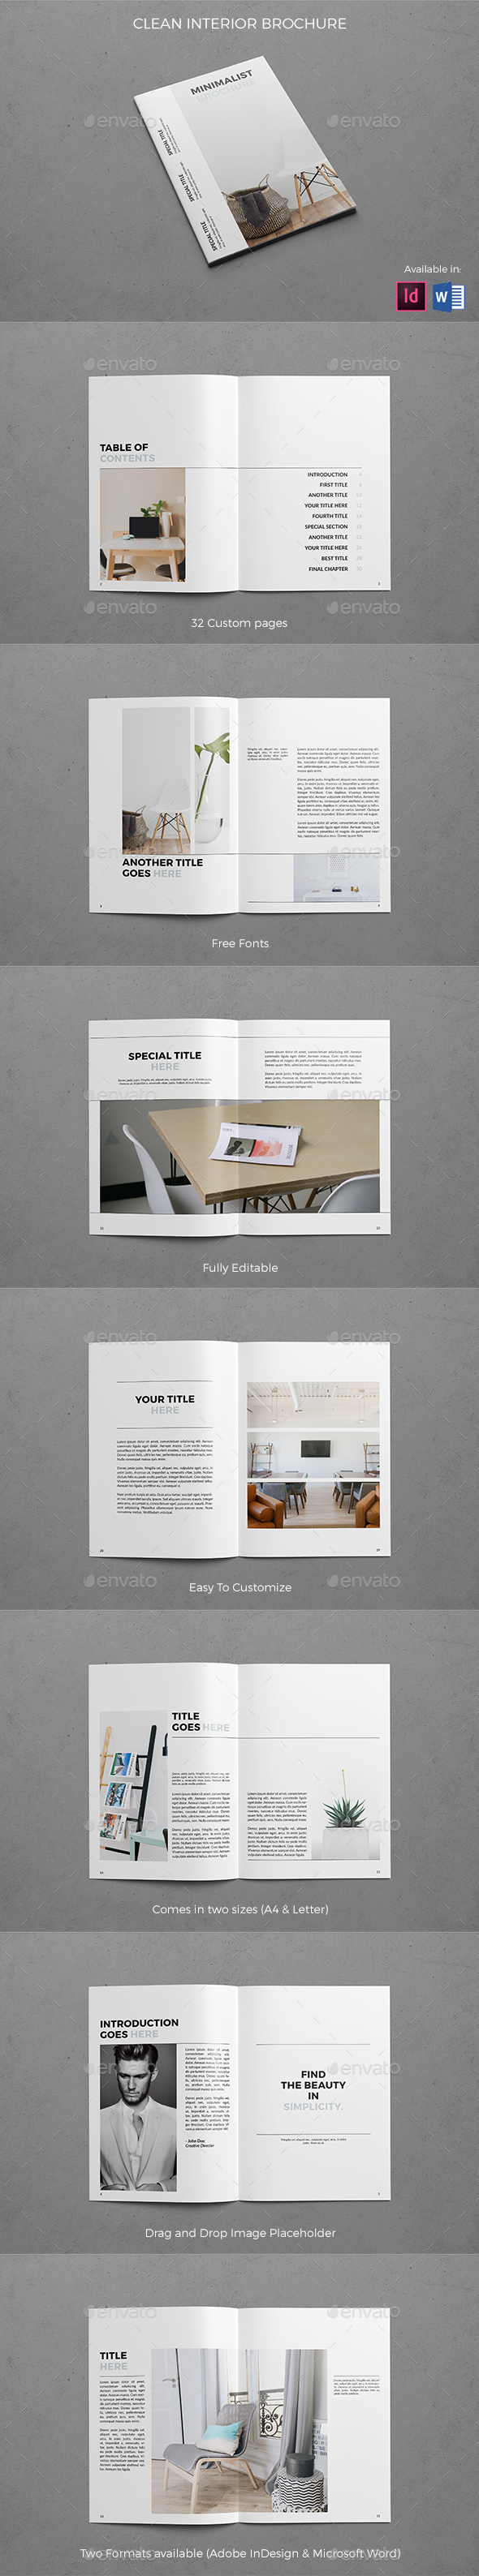 Clean Interior Brochure - Brochures Print Templates